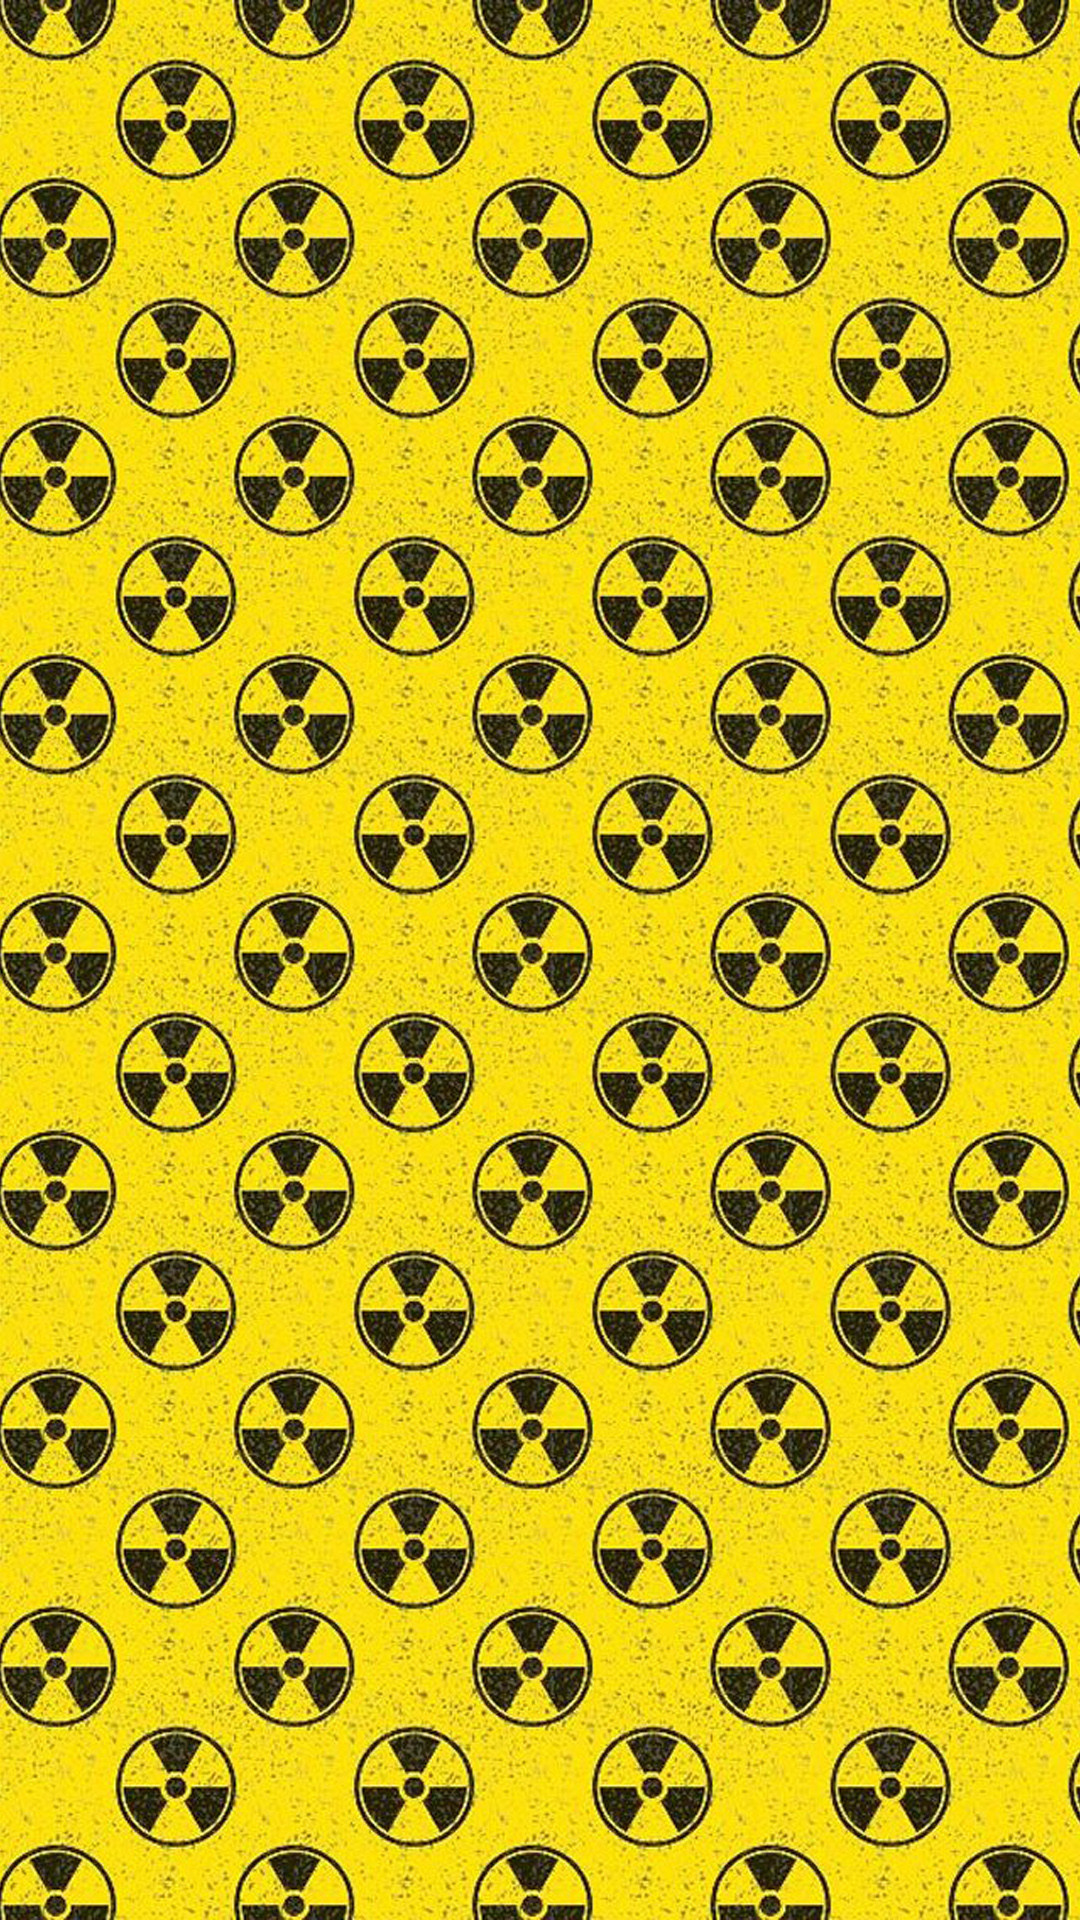 Res: 1080x1920, Pattern yellow radioactive Nexus 5 Wallpapers